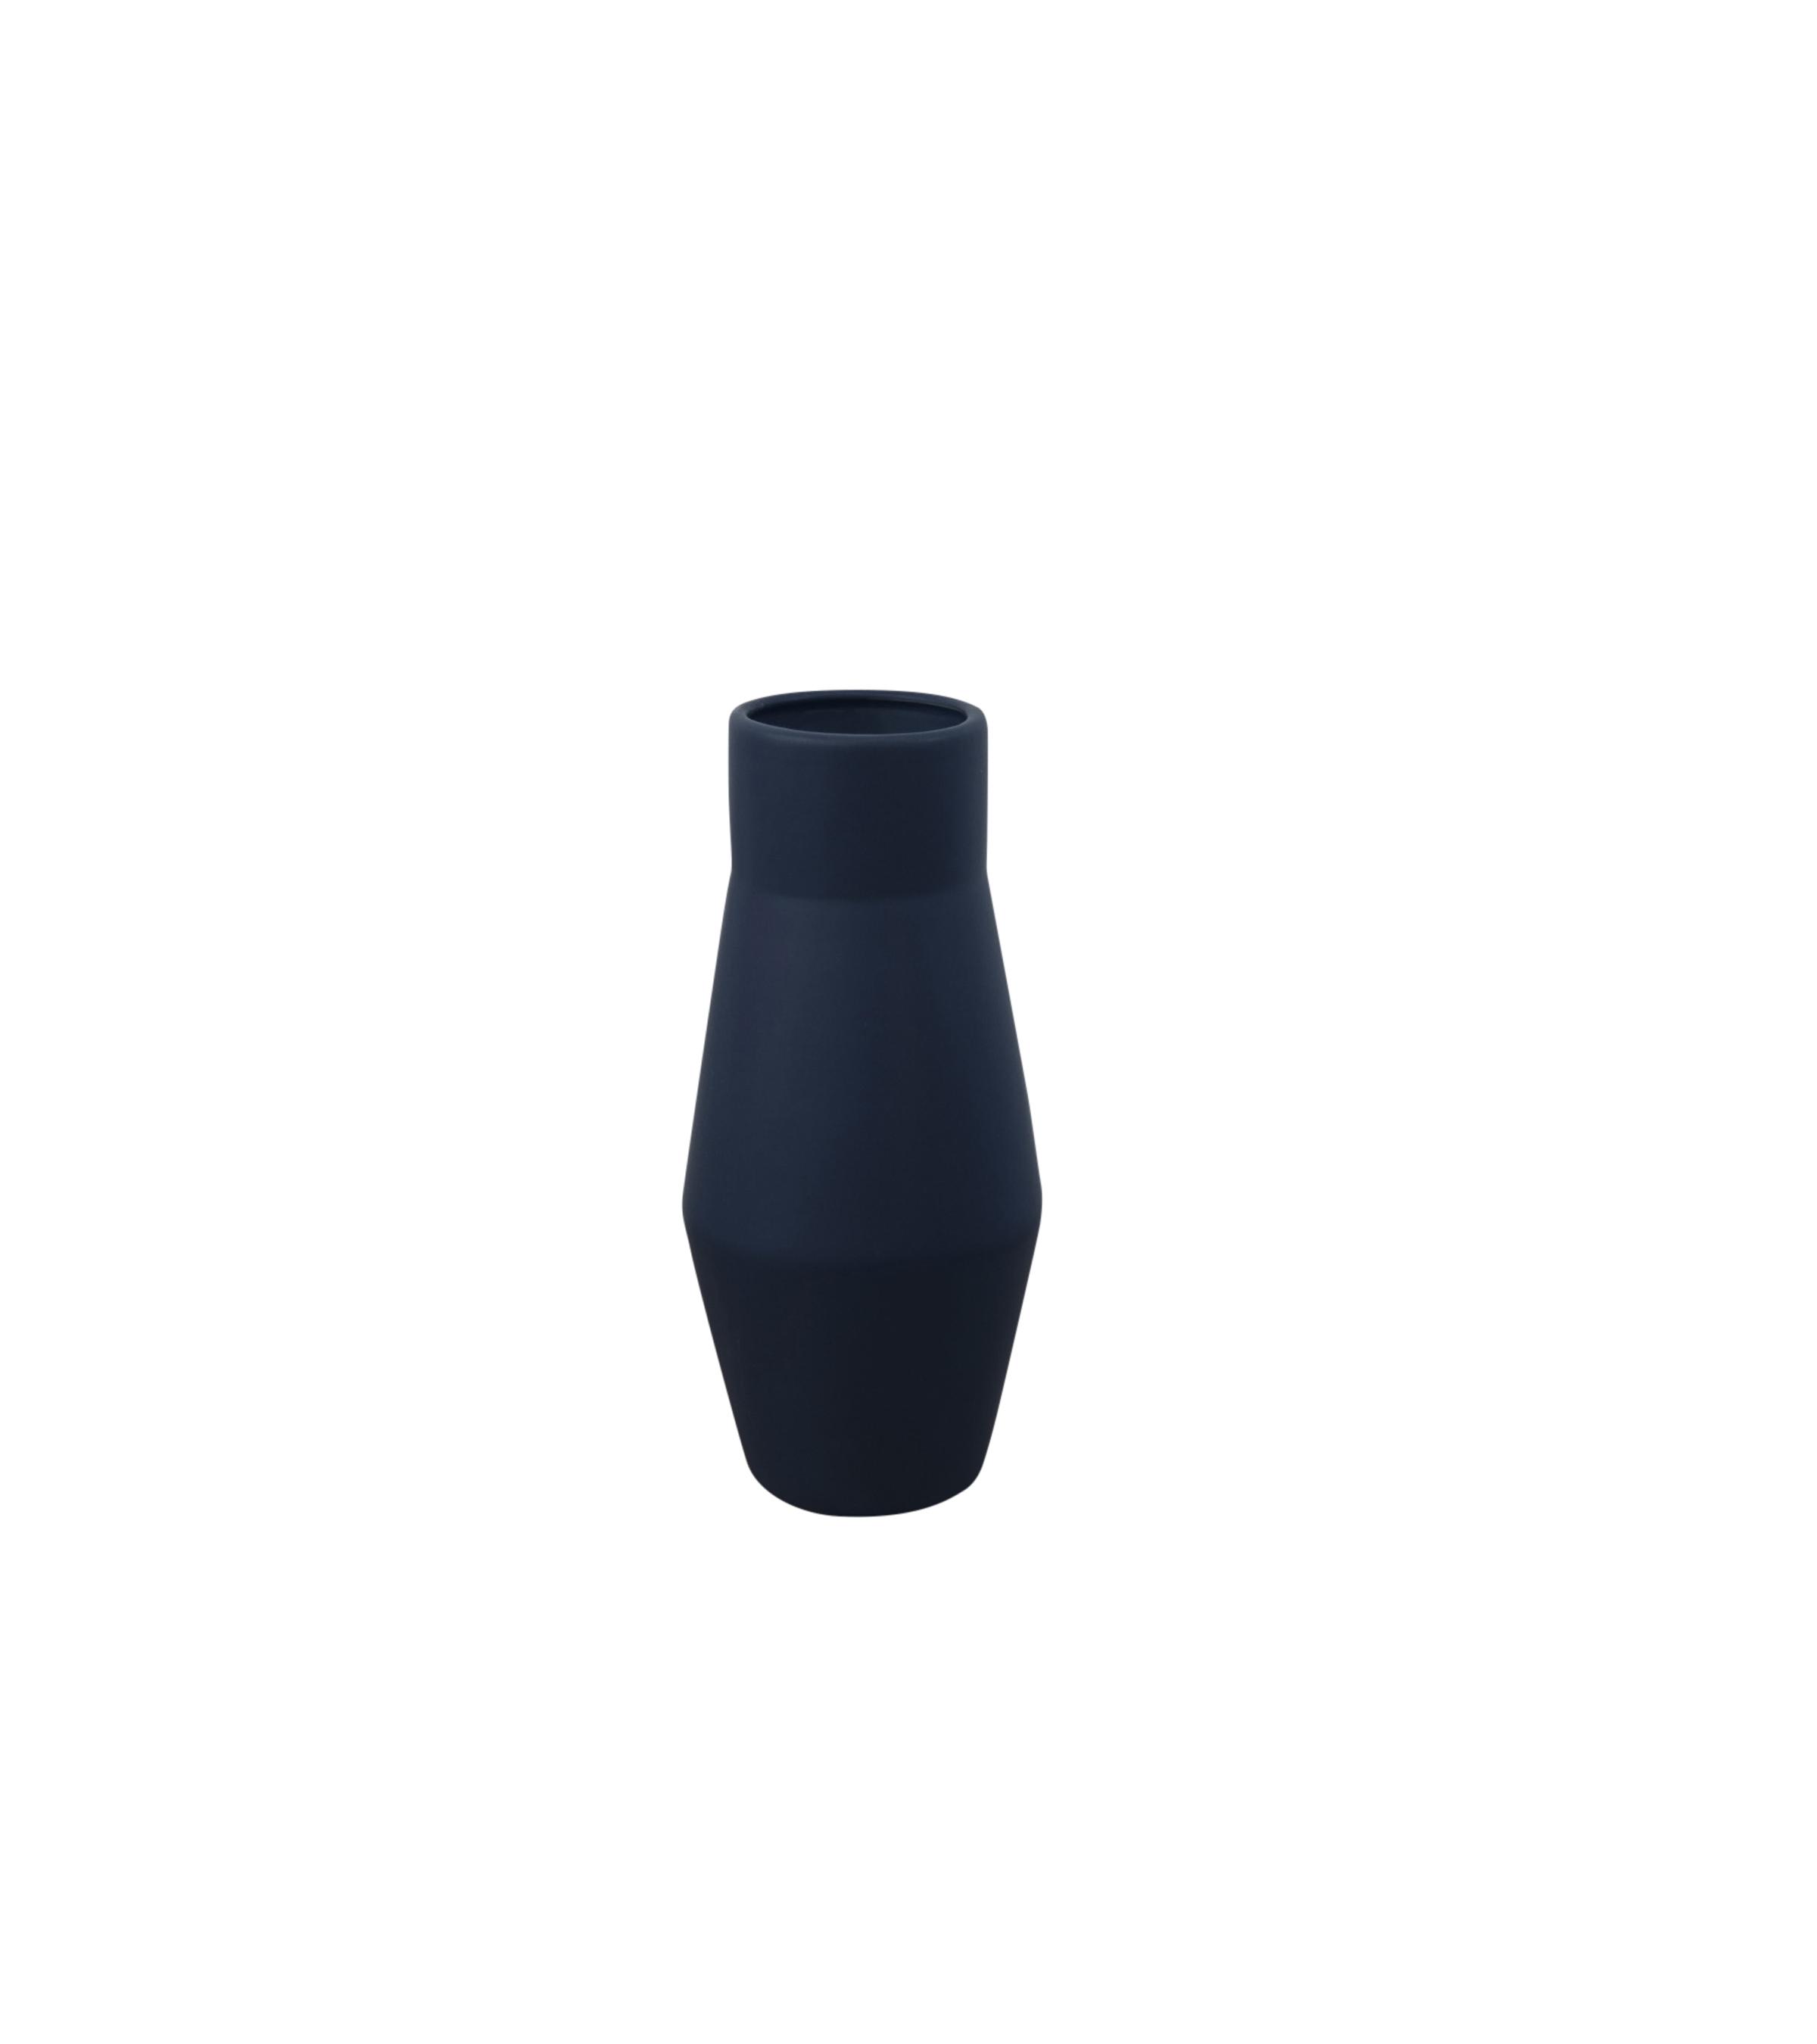 'Bolt' vase